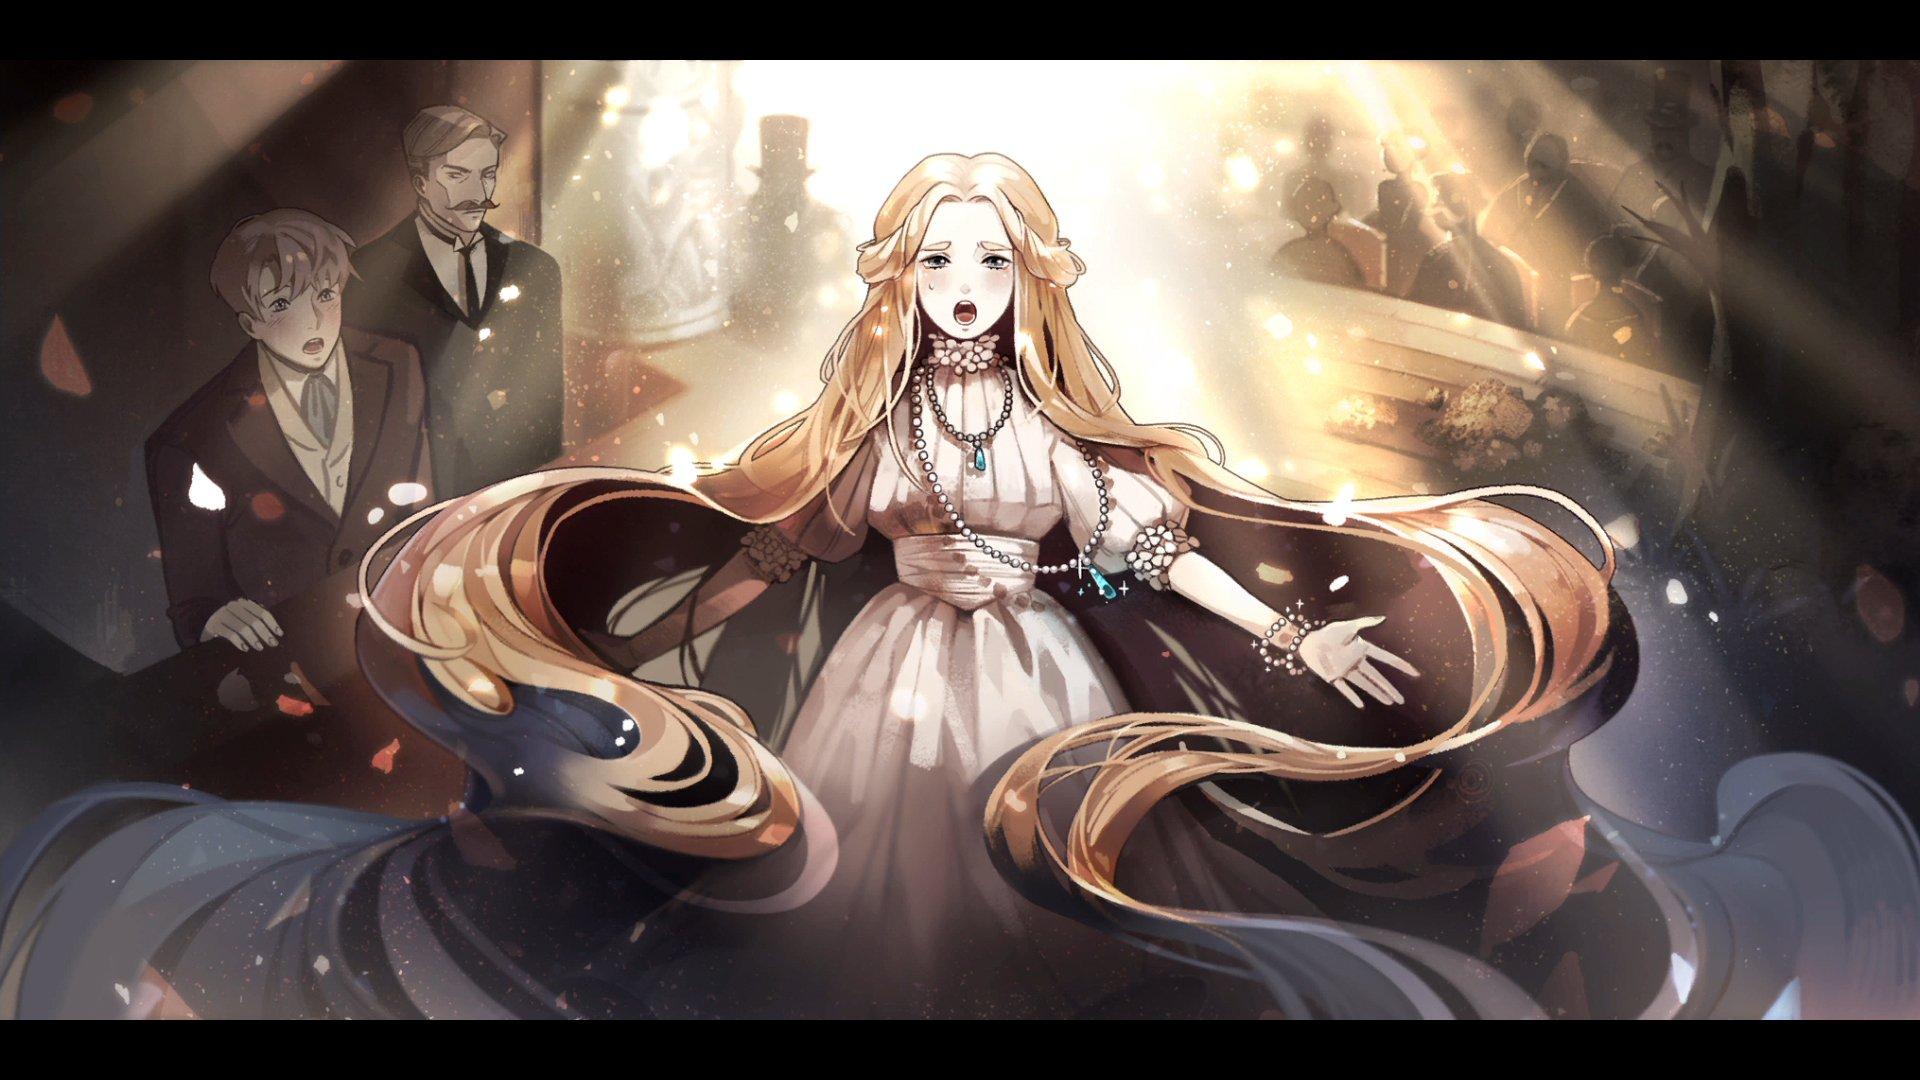 MazM-The-Phantom-of-the-Opera_2021_03-10-21_002